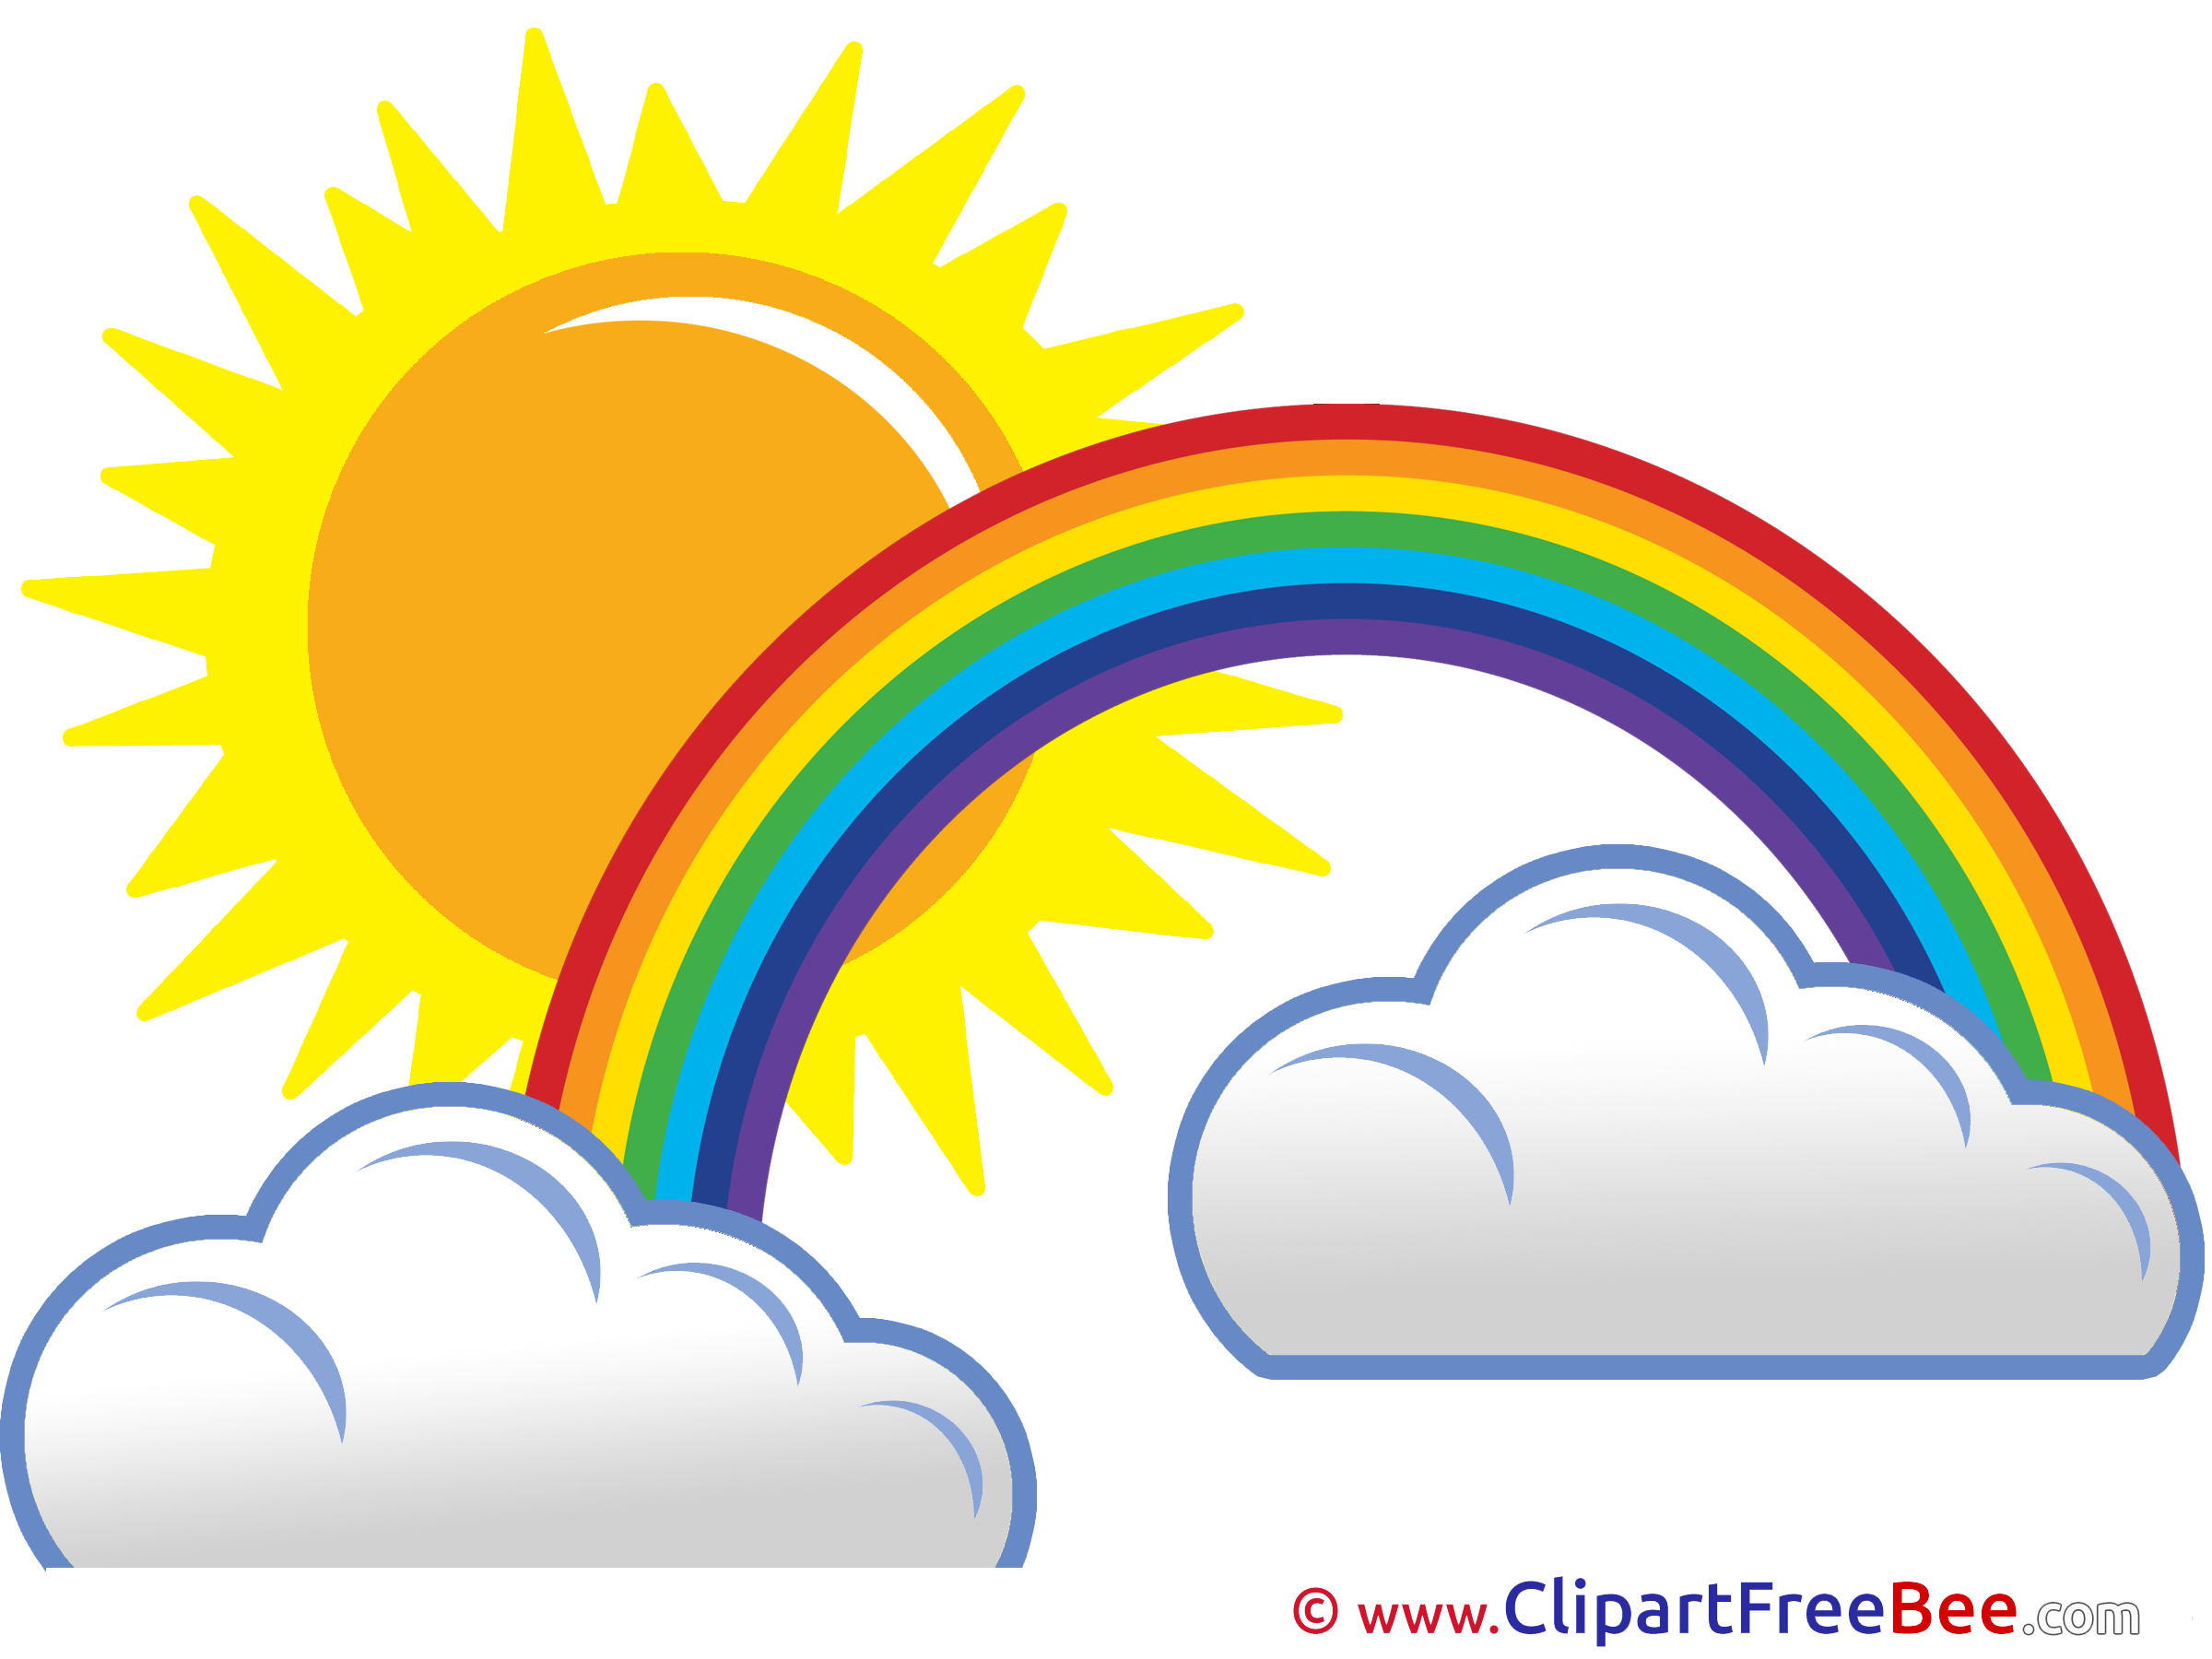 2400x1800 Sunny Day Rainbow Clouds Sun Pics Free Illustration